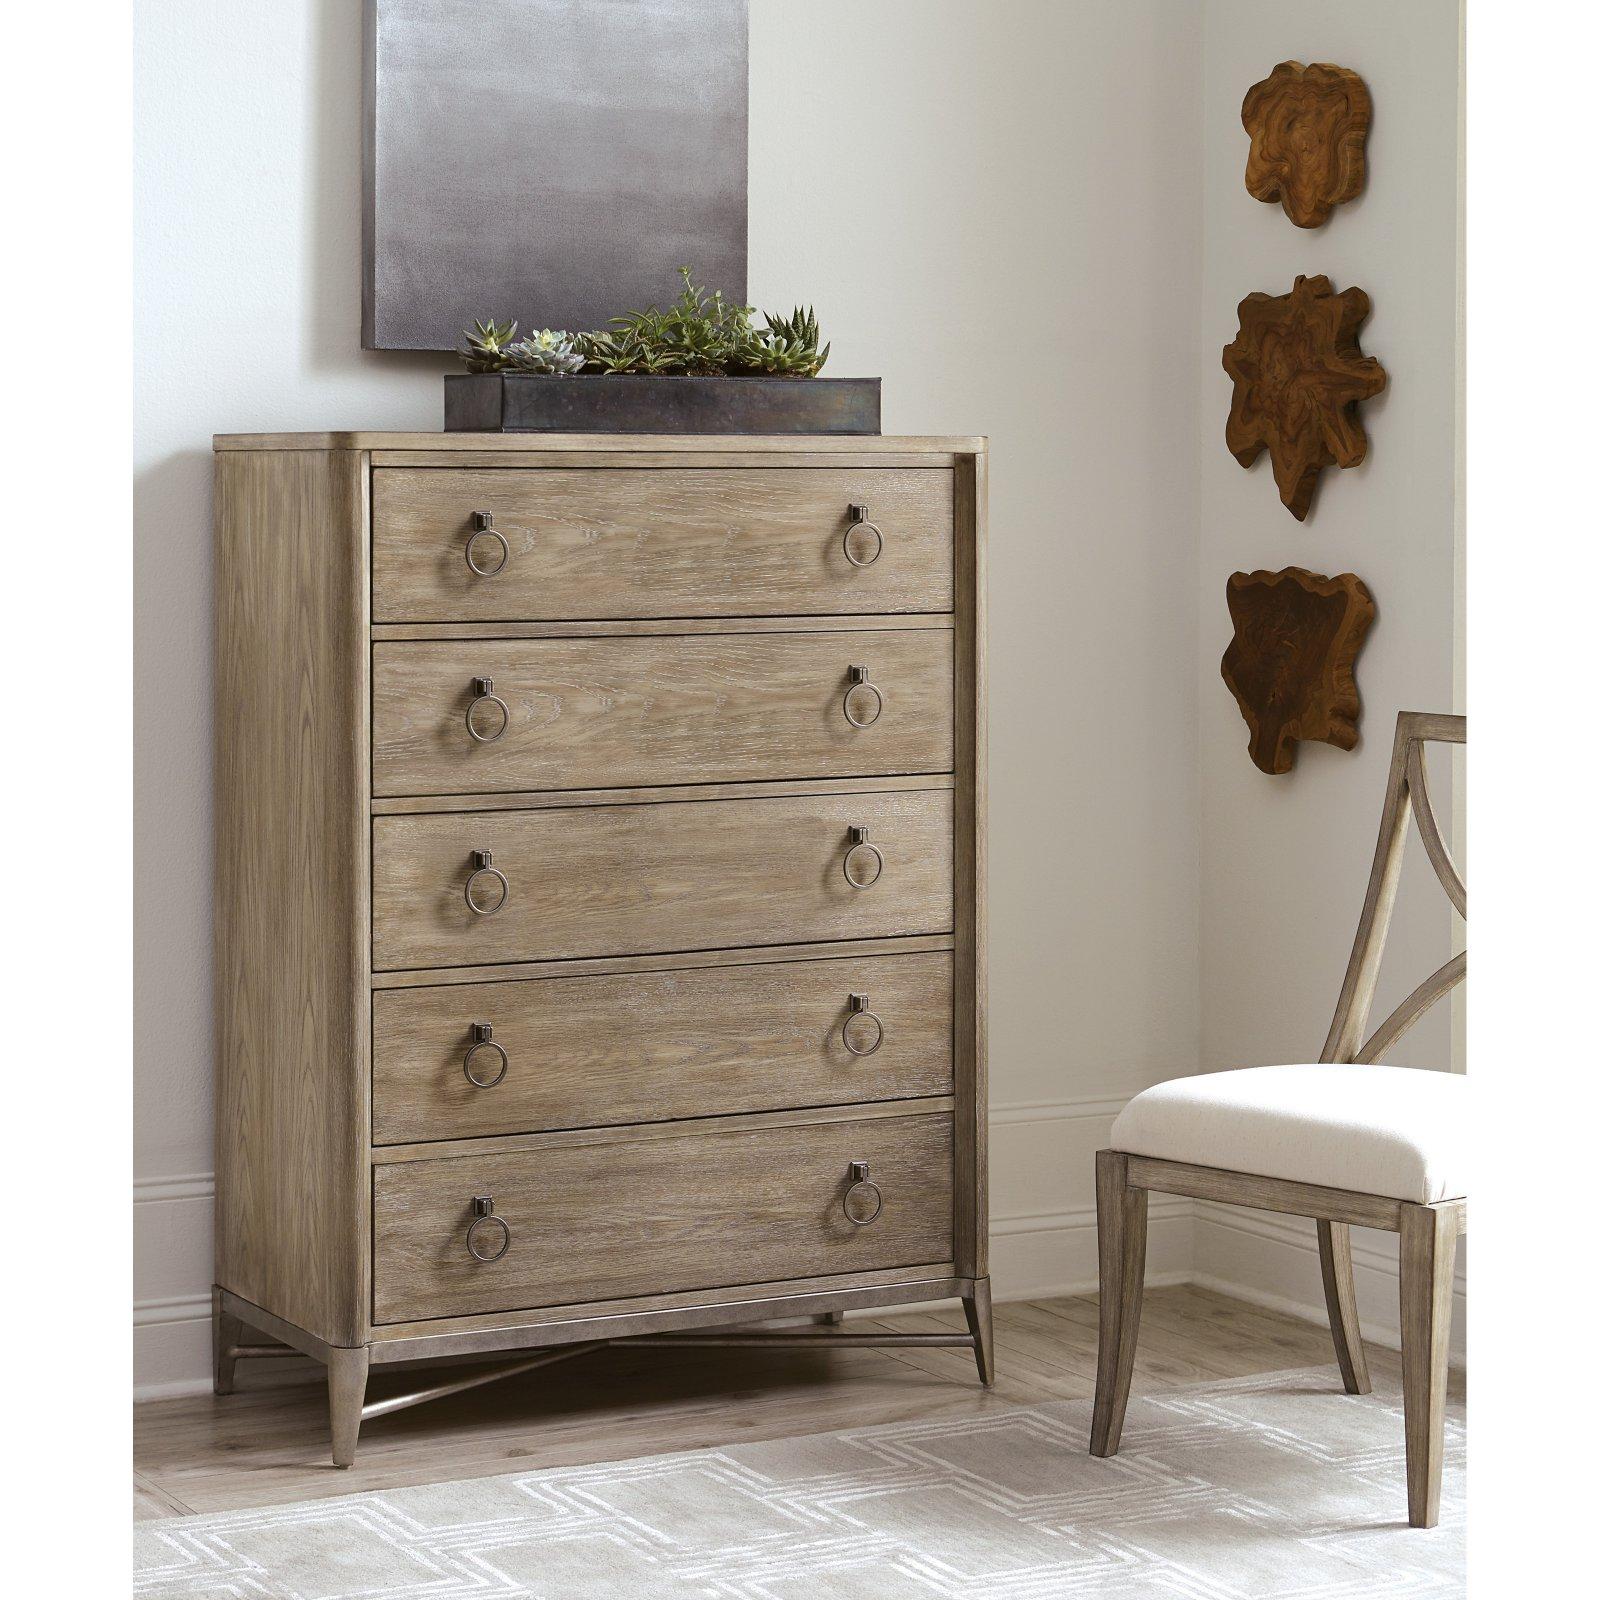 Riverside Furniture Sophie 5 Drawer Chest